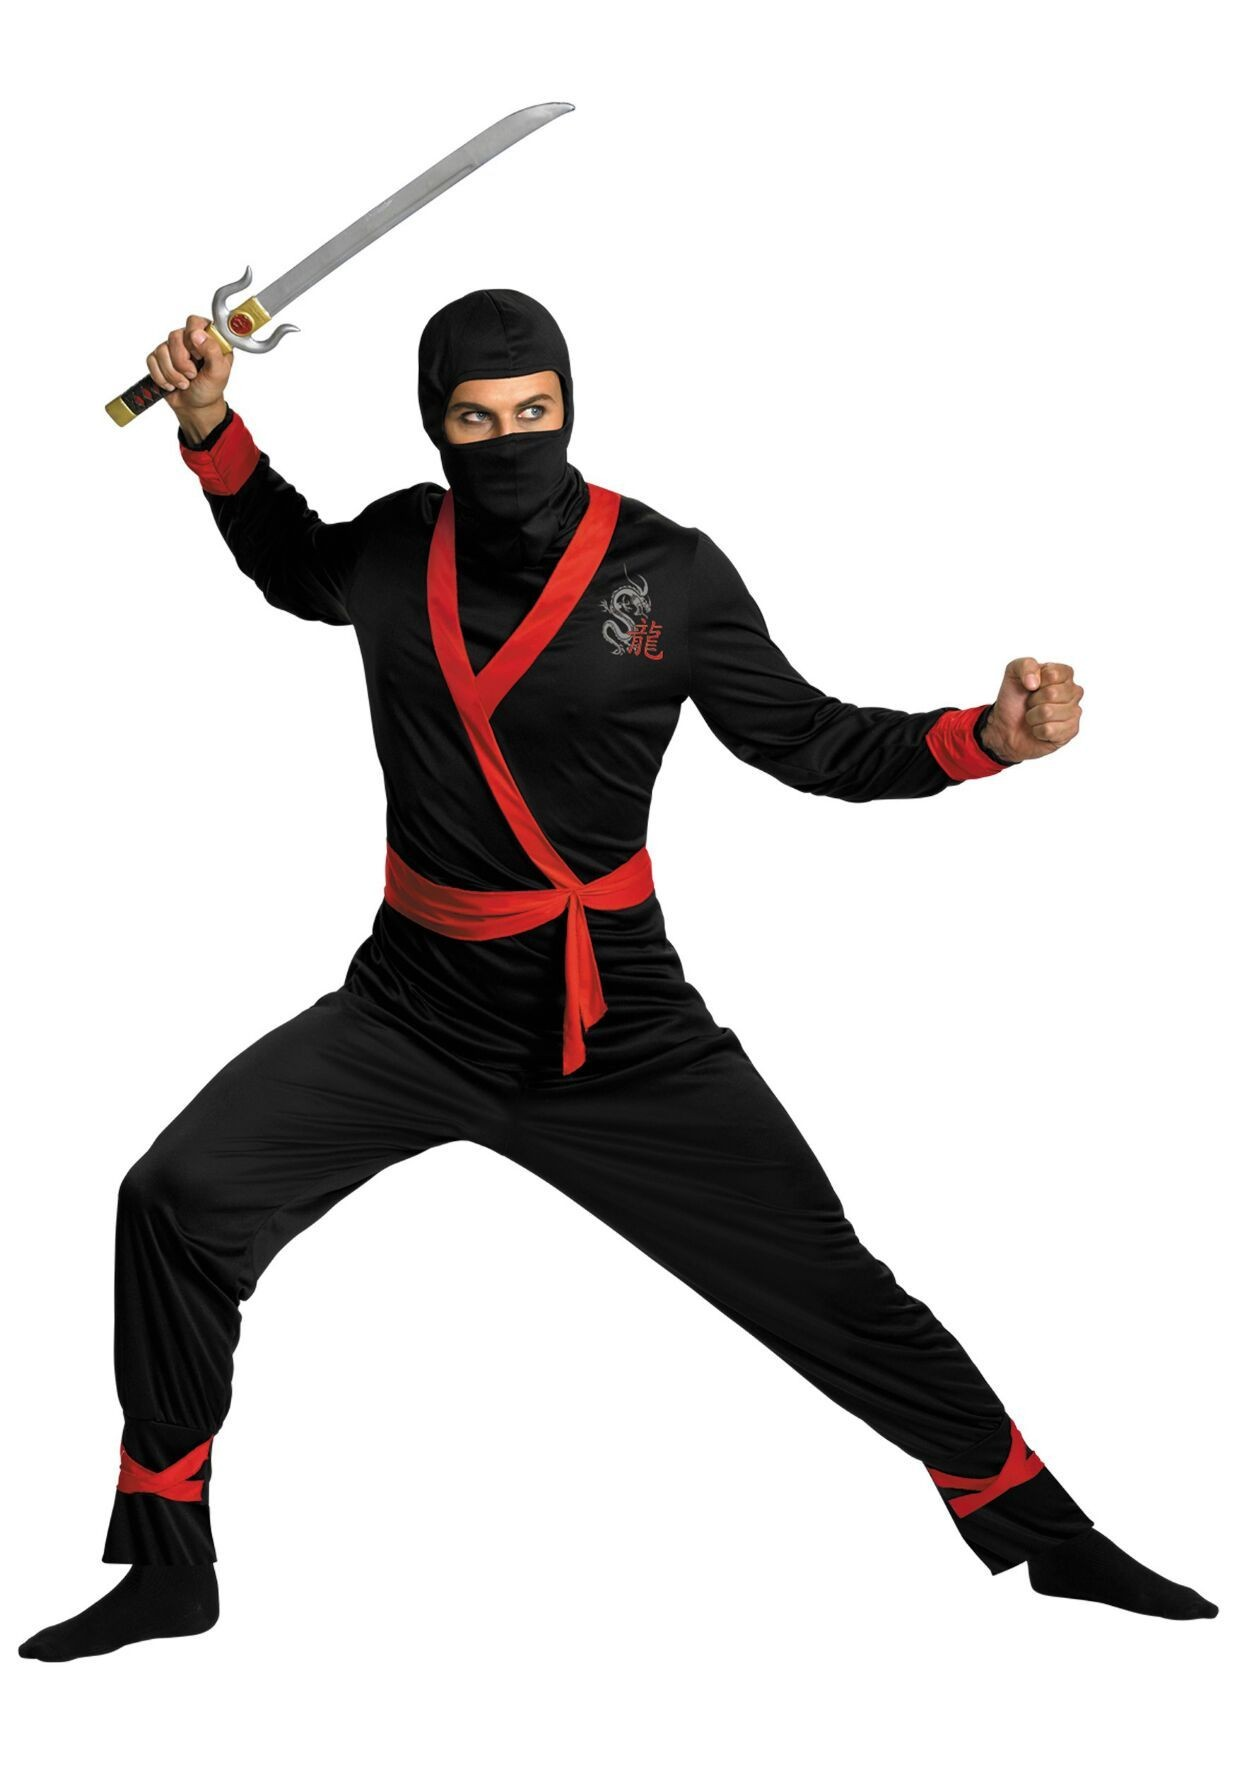 But cool but not good enough you evil villains. Ninja get them.